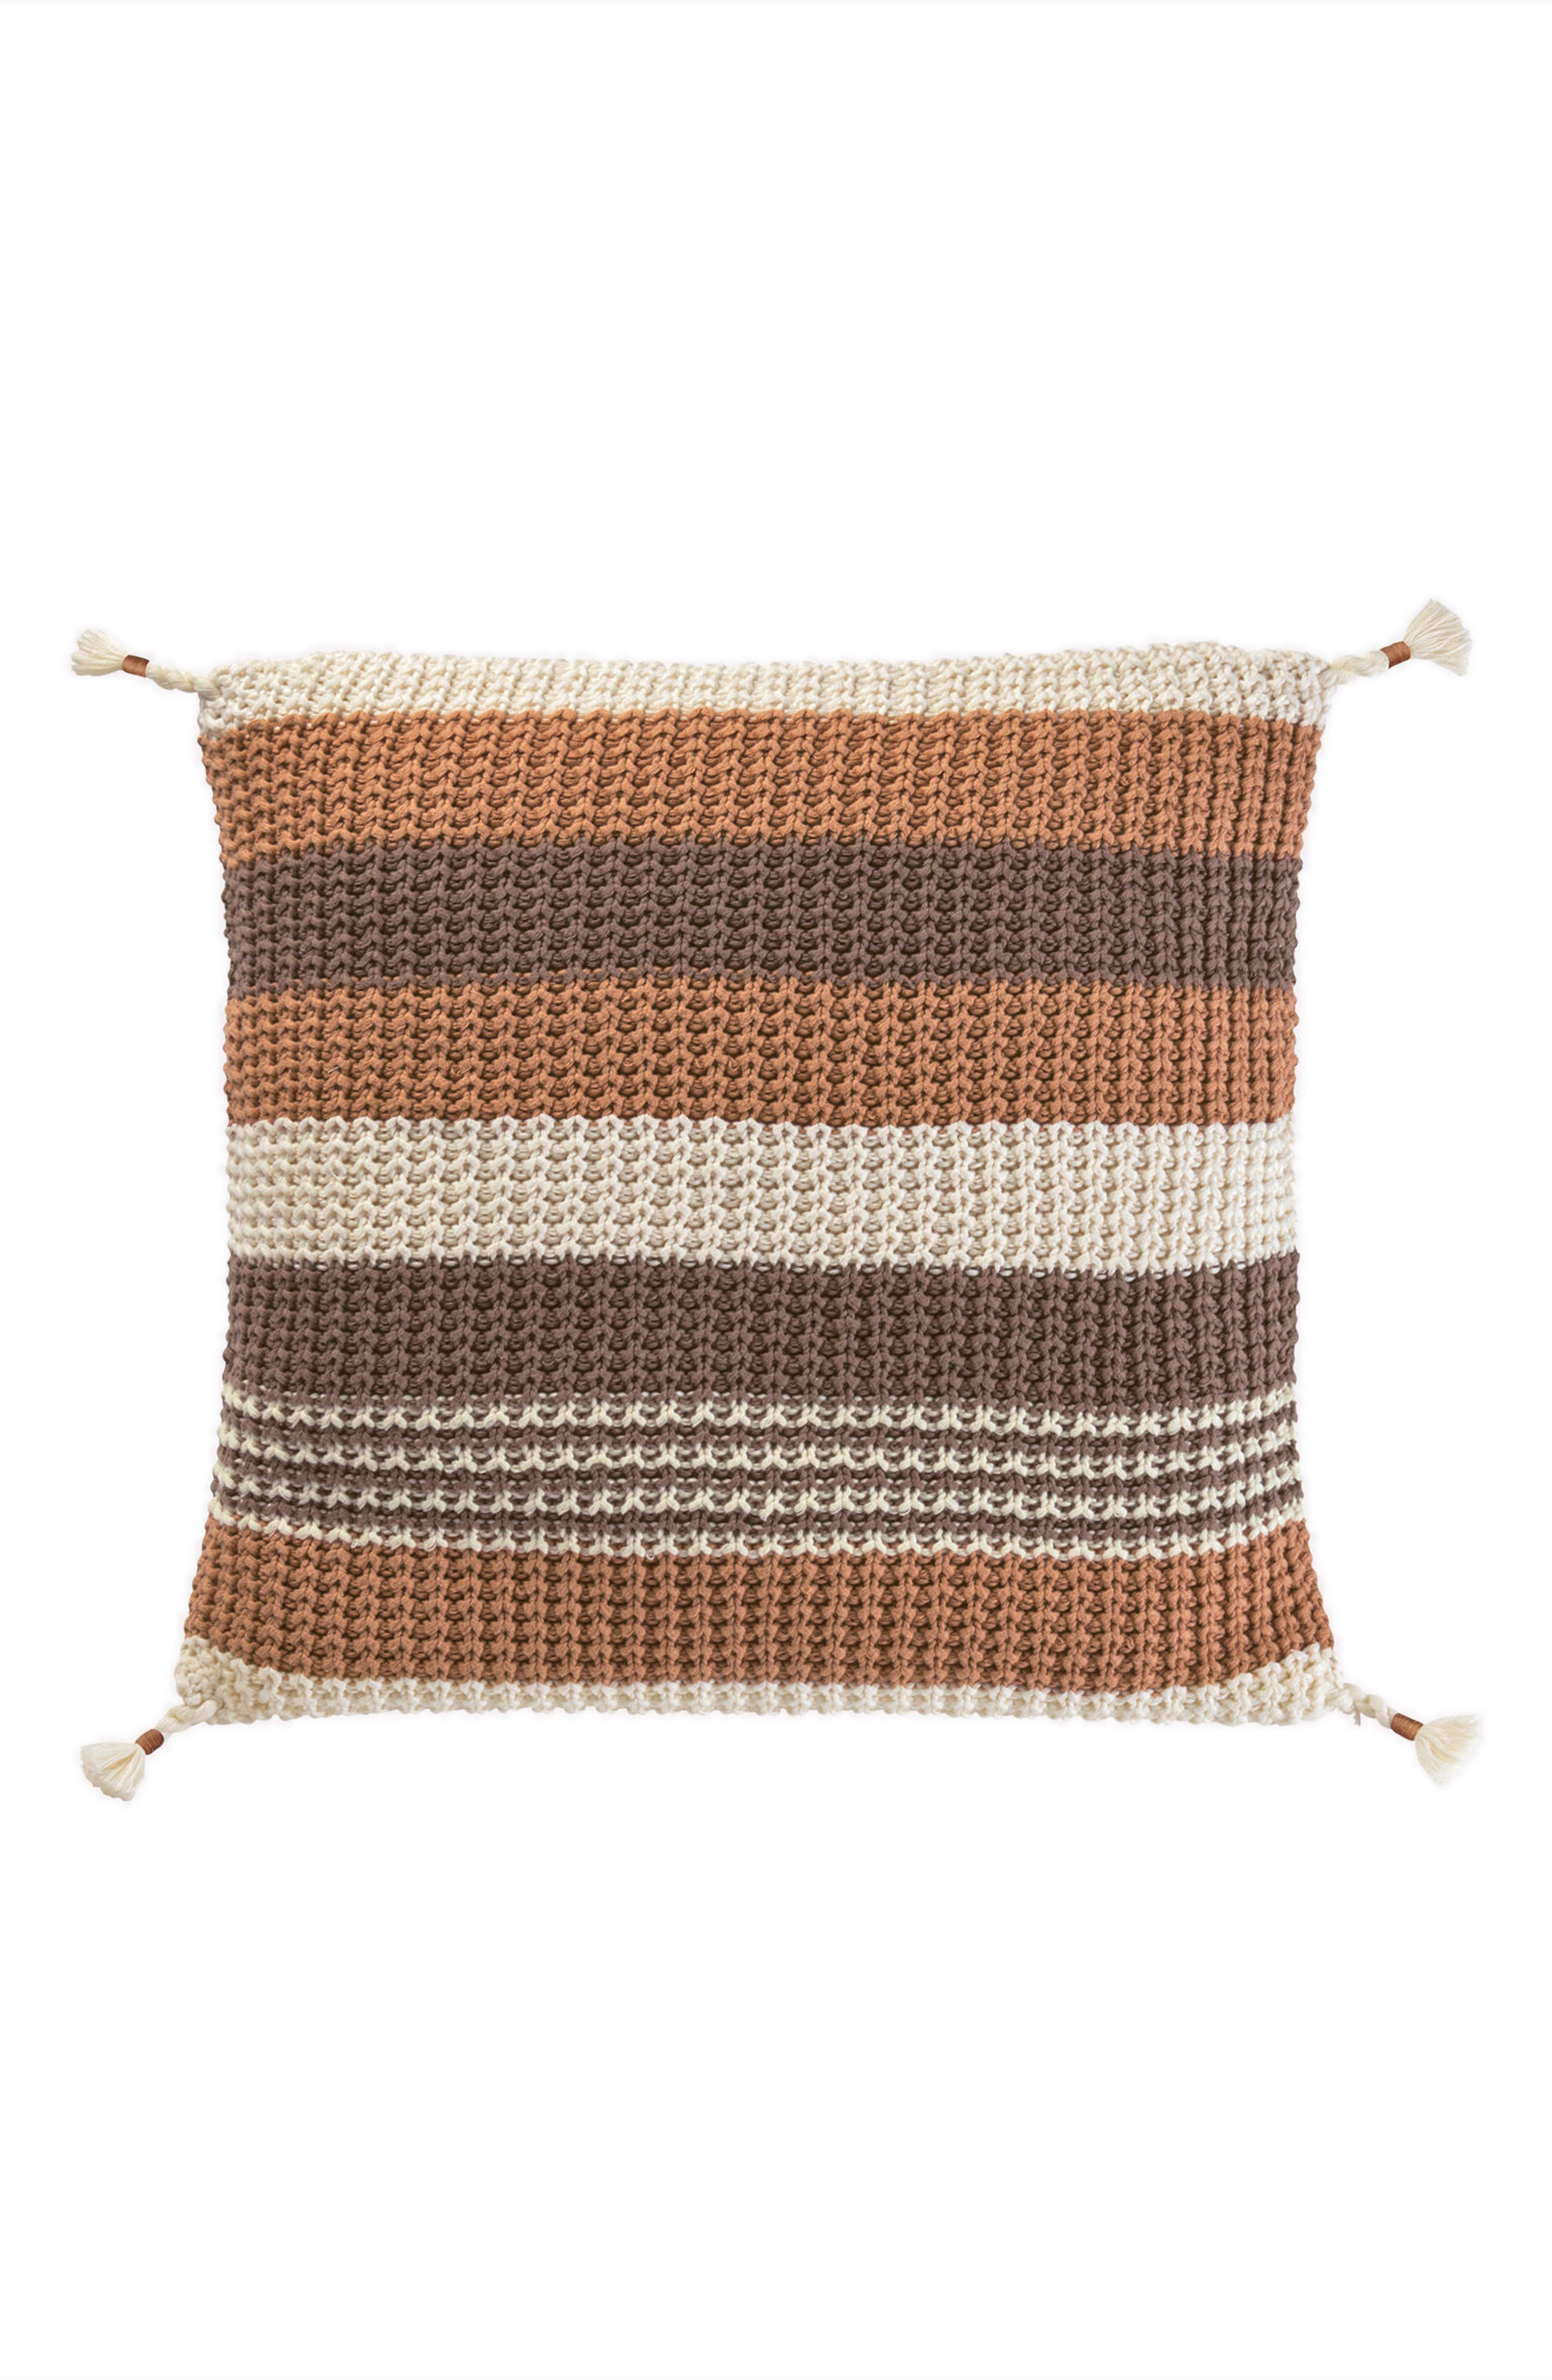 Horizon Stripe Knit Accent Pillow,                         Main,                         color, Tan Multi